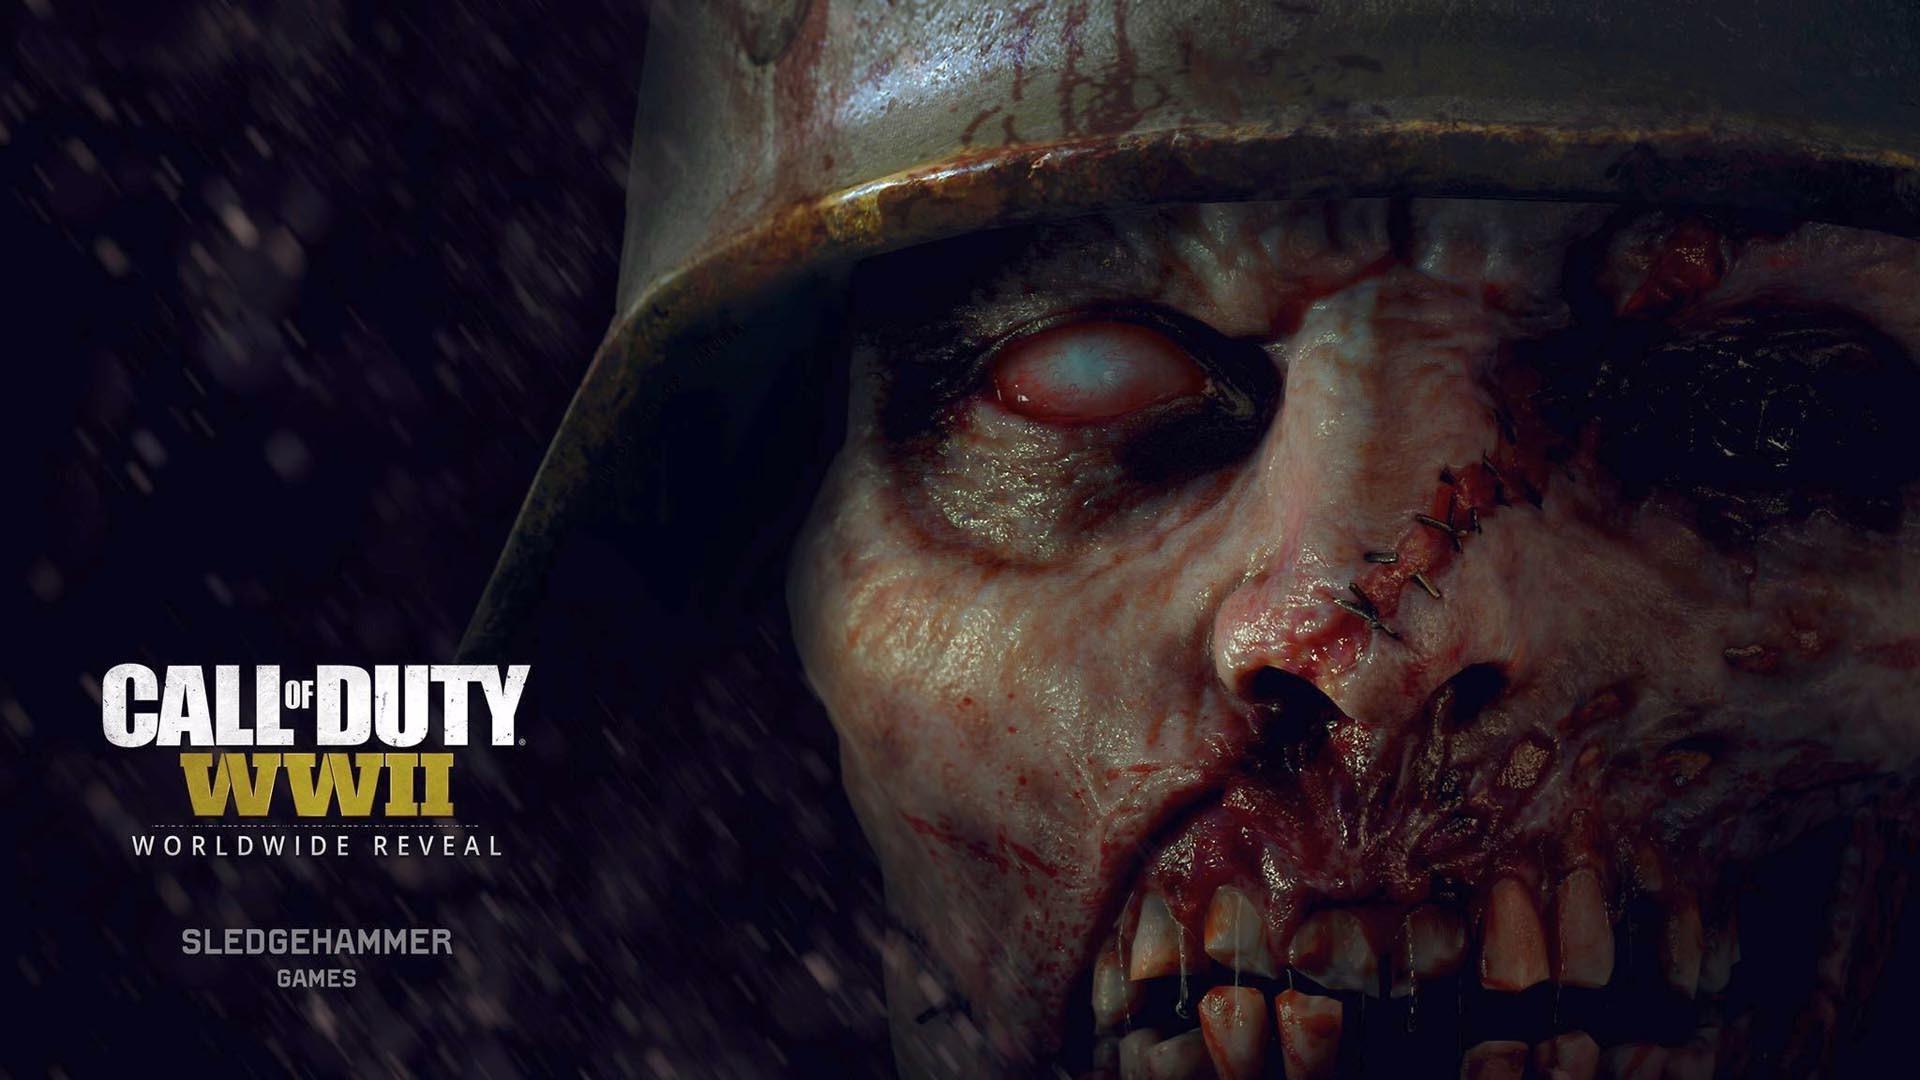 Call of Duty: WWII – Nazi Zombies Mod wallpaper